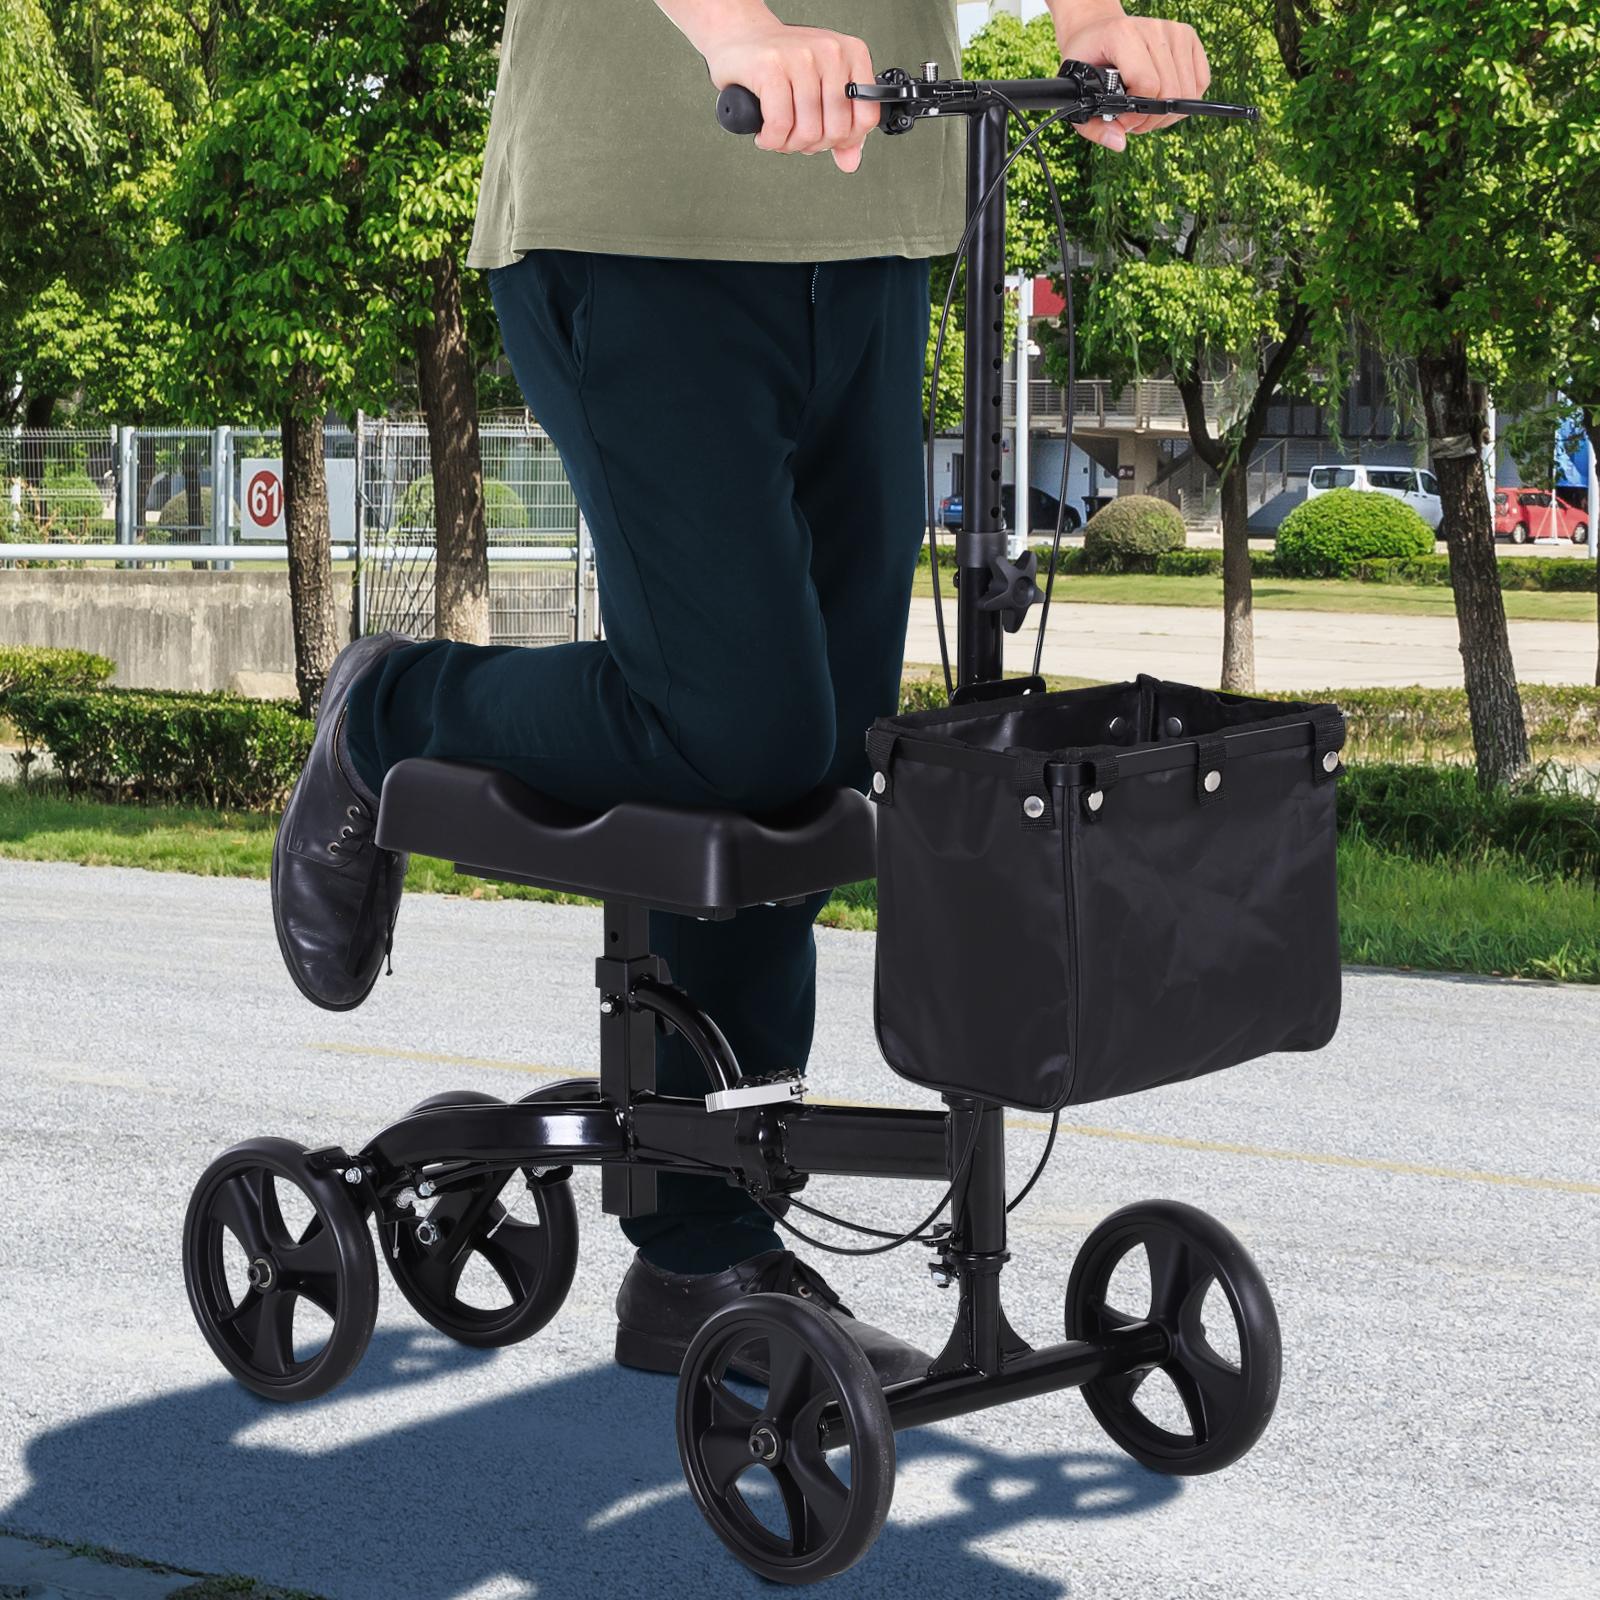 HOMCOM Foldable Dual Pad Steerable Leg Knee Walker Scooter - $84.99 + Free Shipping